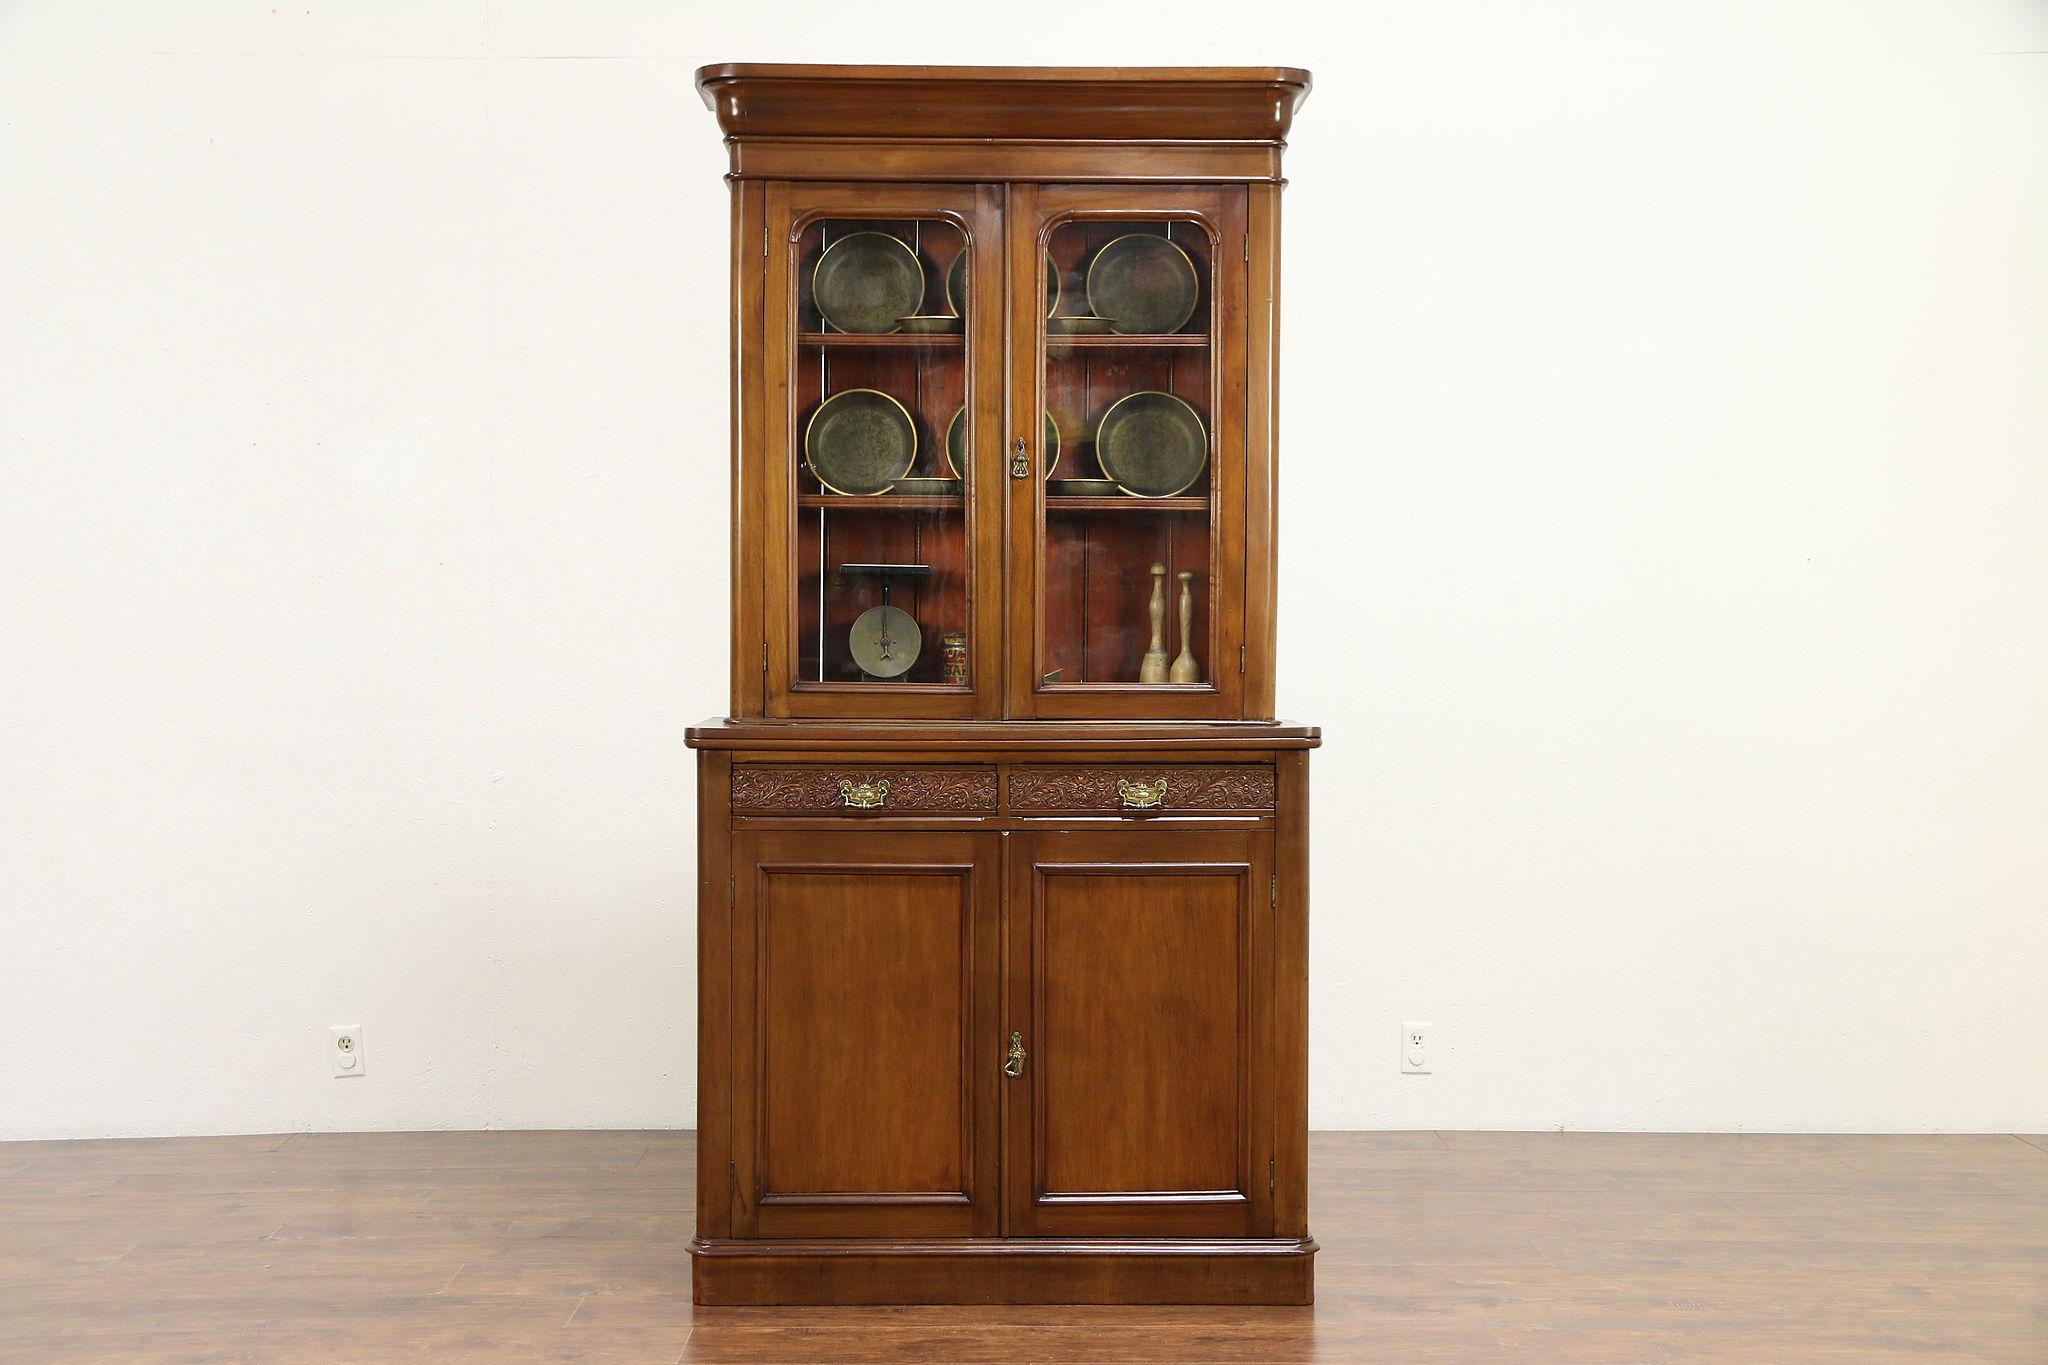 Victorian English Antique Mahogany Bookcase Cabinet Wavy Glass